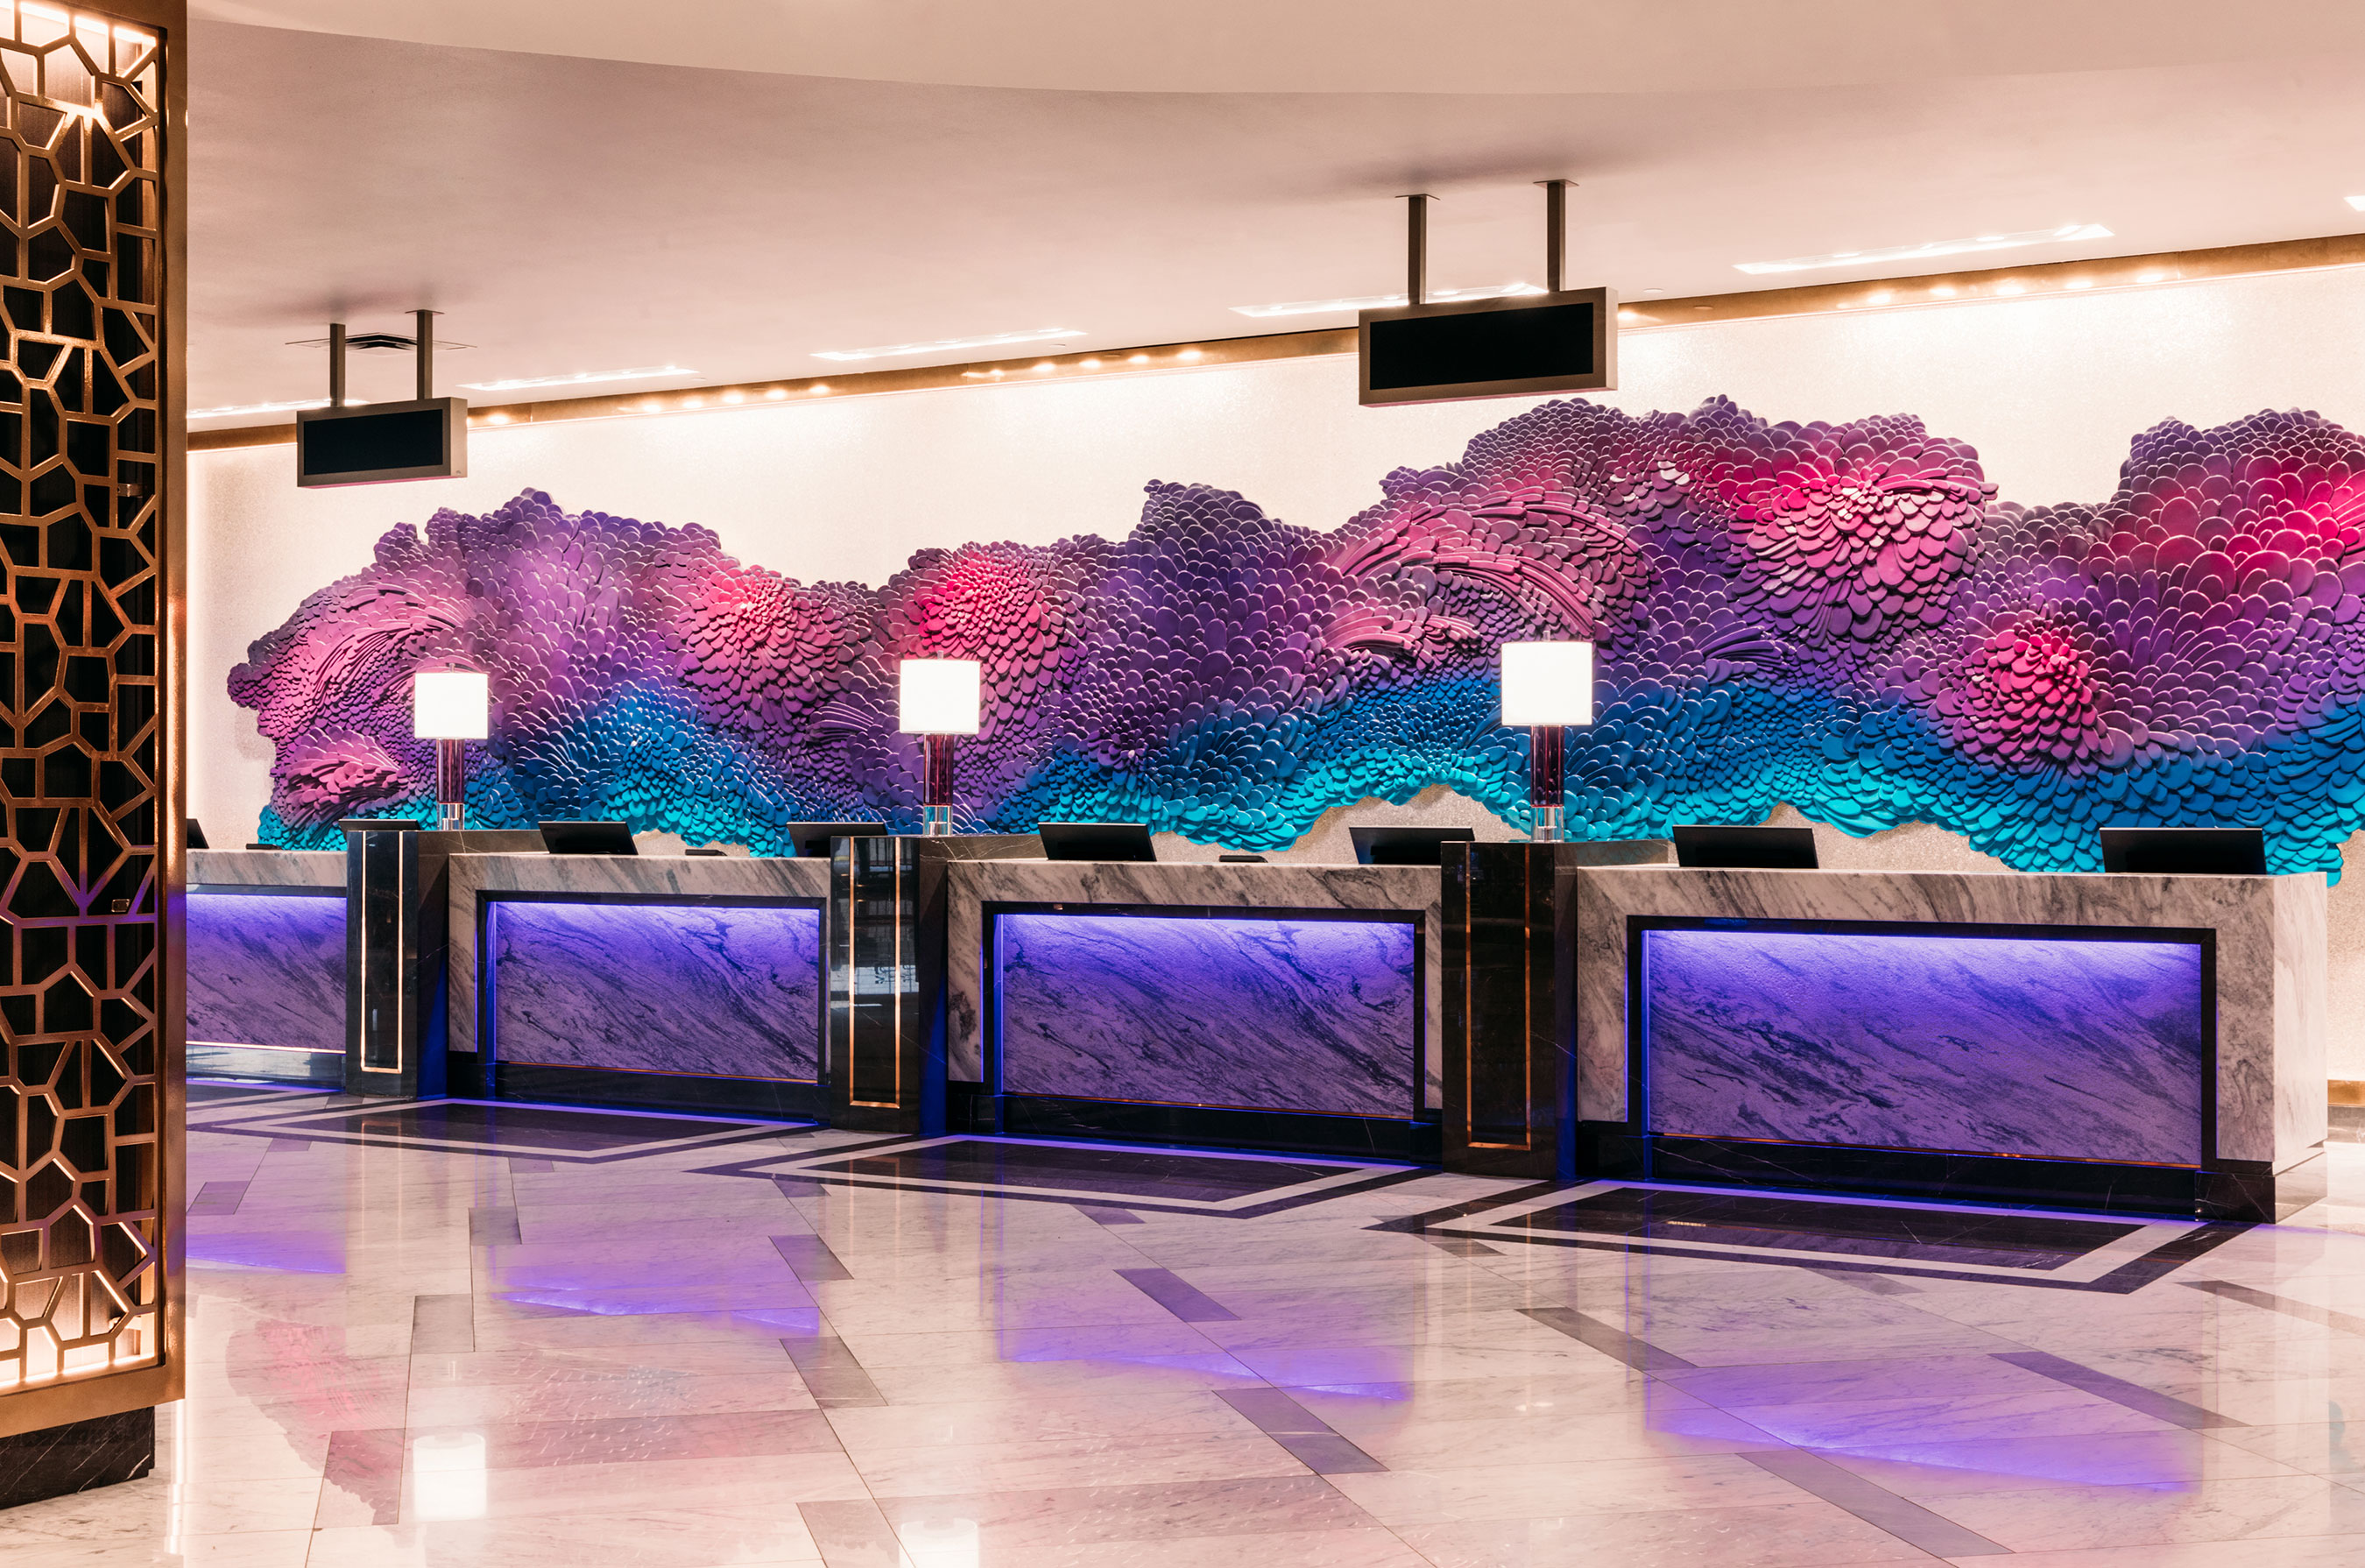 Redesigned Hotel Lobby at Harrah's Las Vegas (Credit: Palm + Ocean Digital)